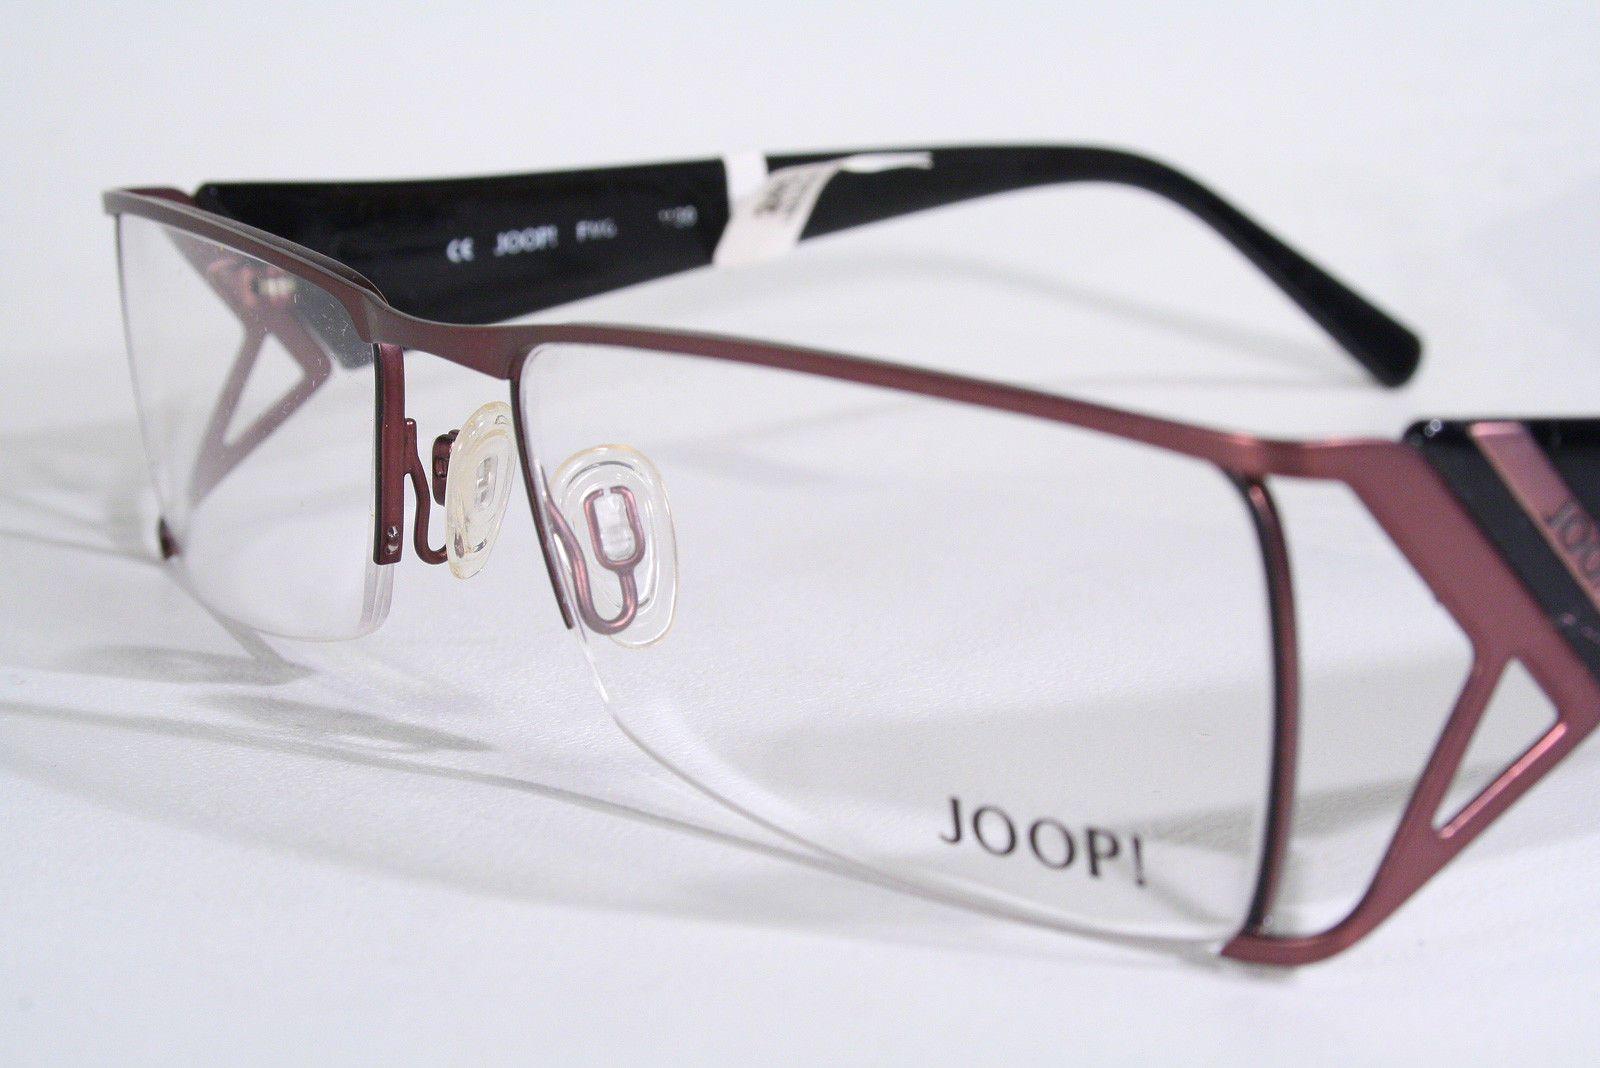 JOOP! 83051 Women Lilac Copper Semi Rimless Eyeglass Frames Glossy ...